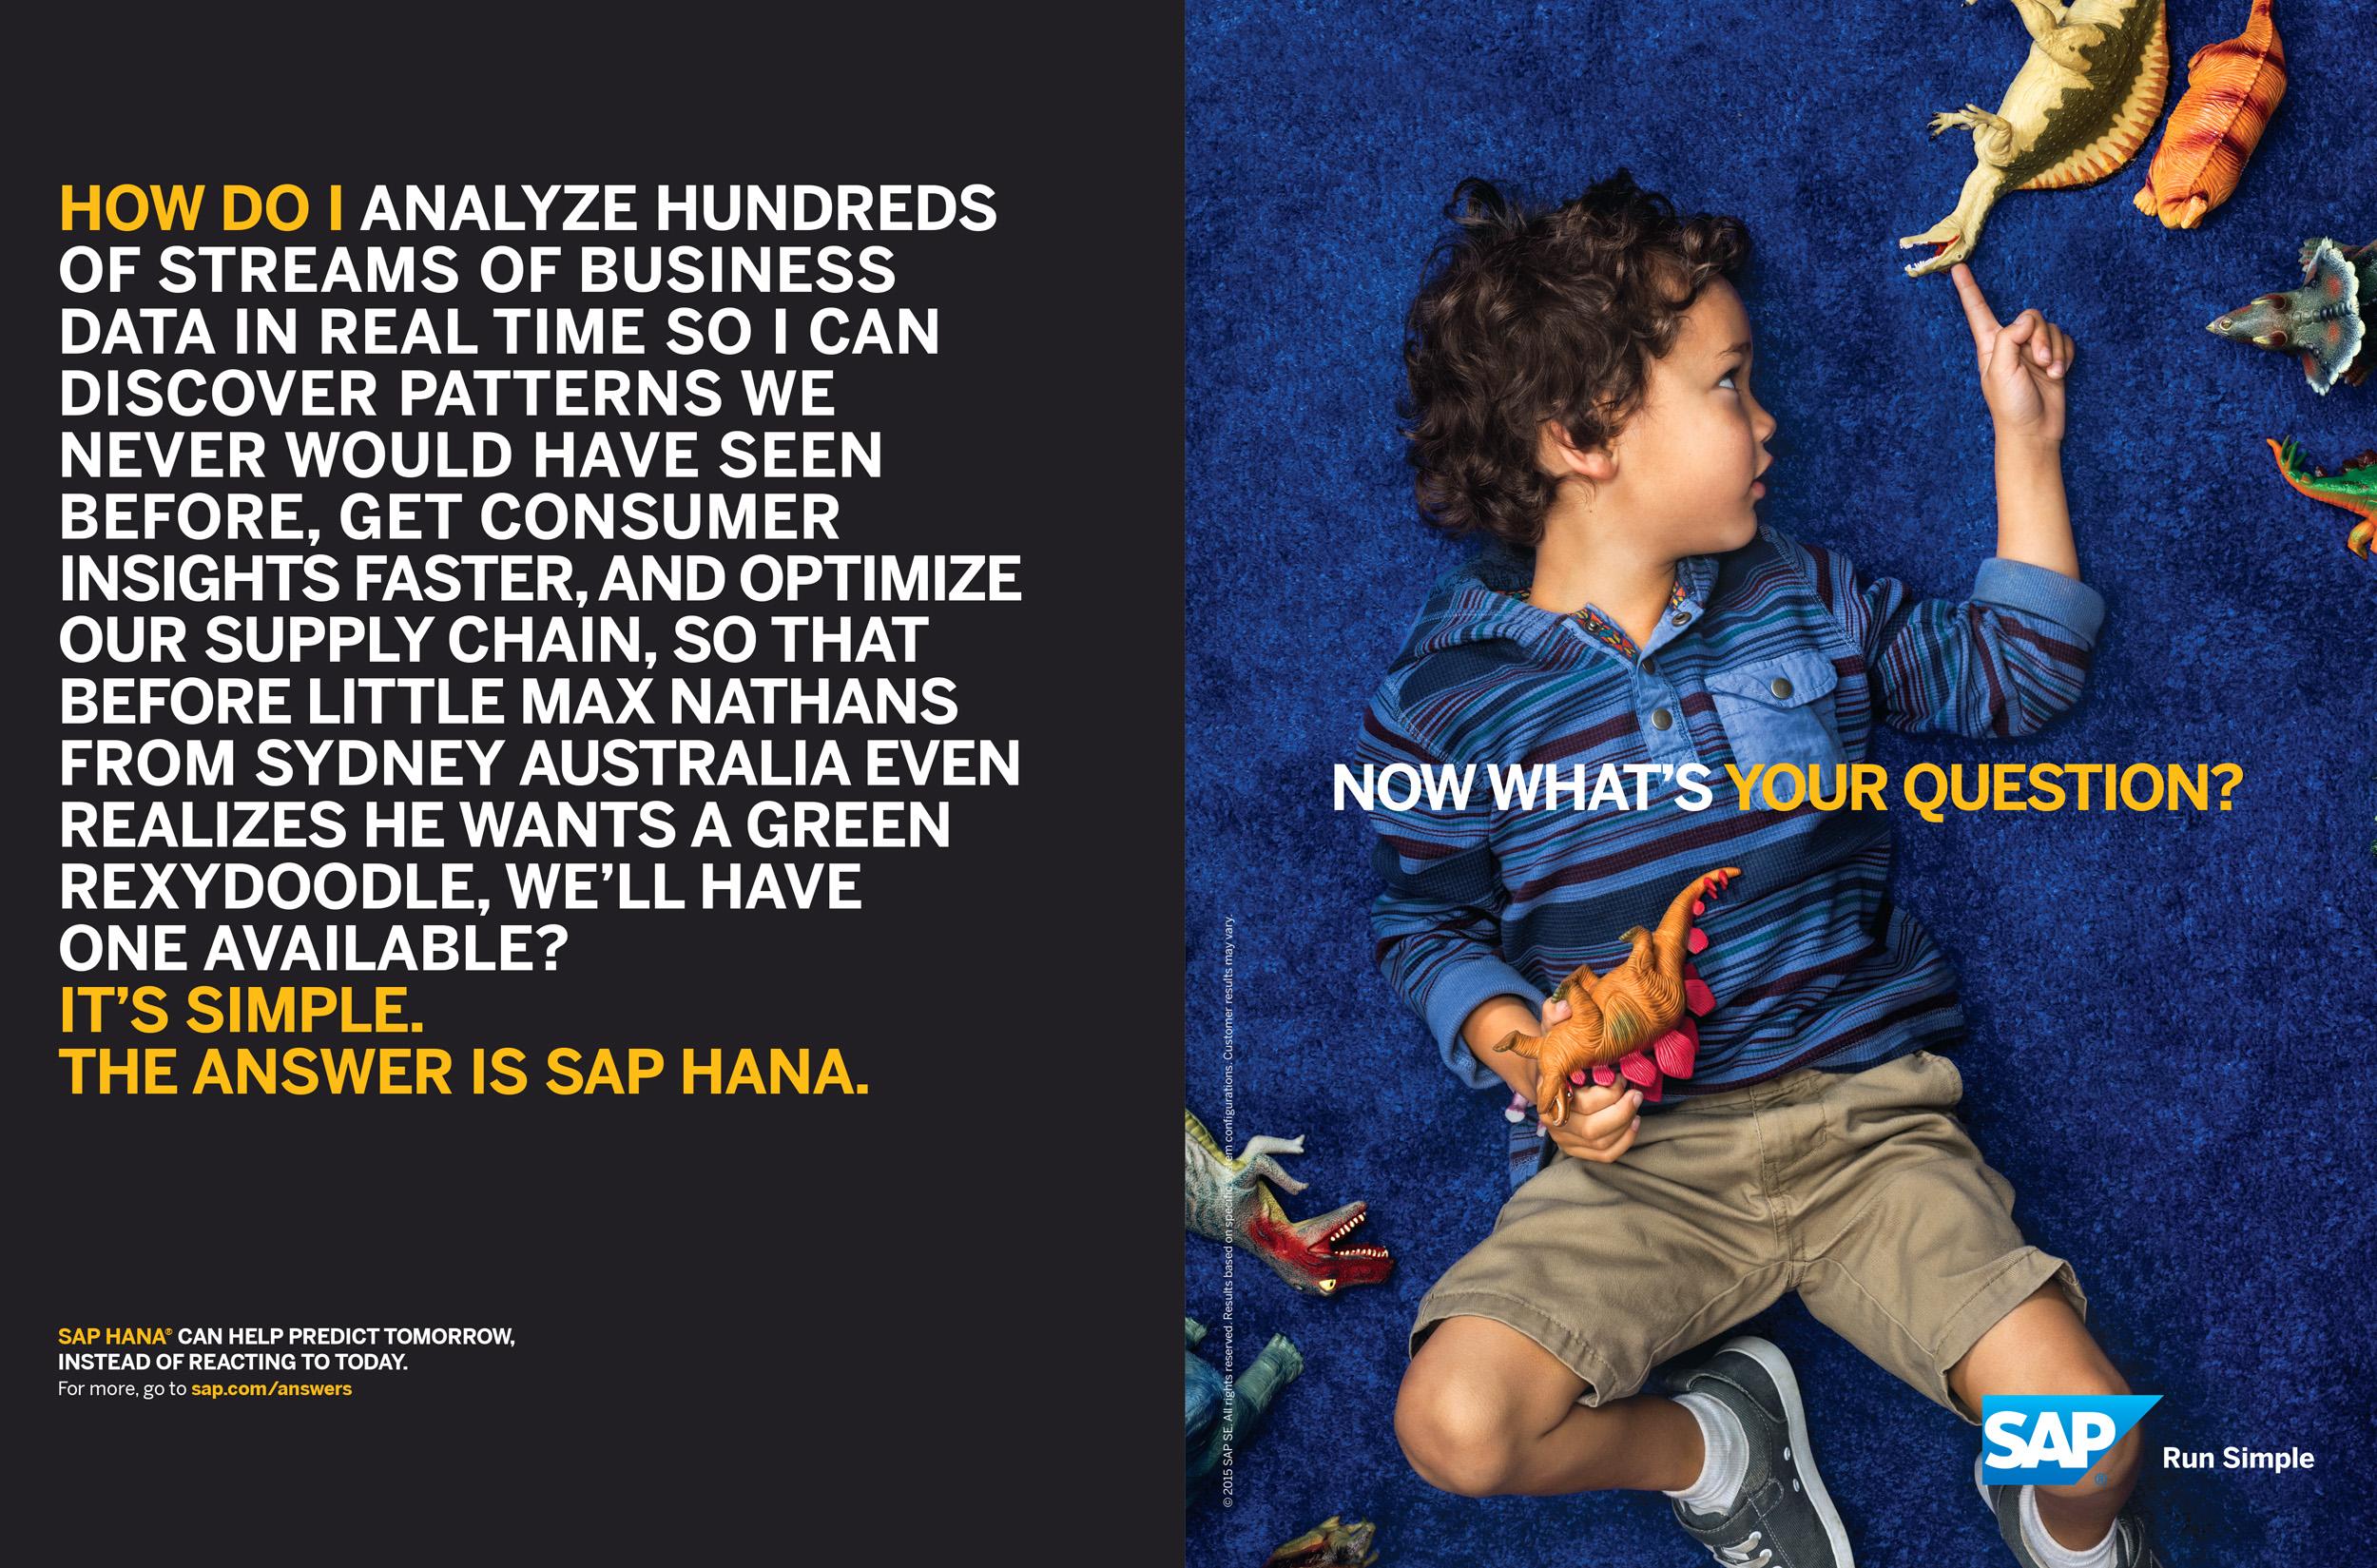 SAP Hana, Advertising